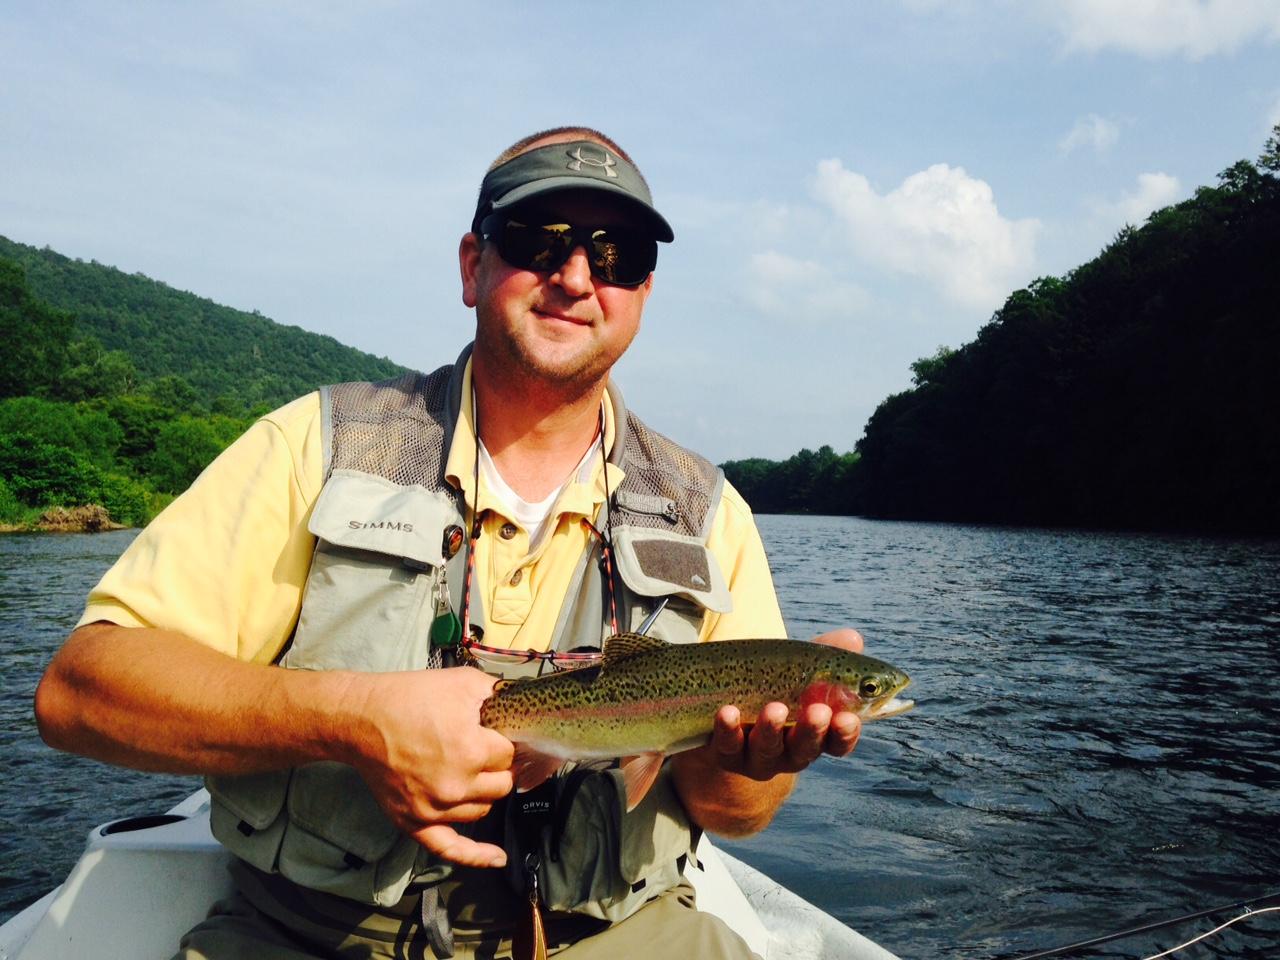 7/6/15 Gene had a nice evening of dry fly fishing. Nicewild Rainbow trout!